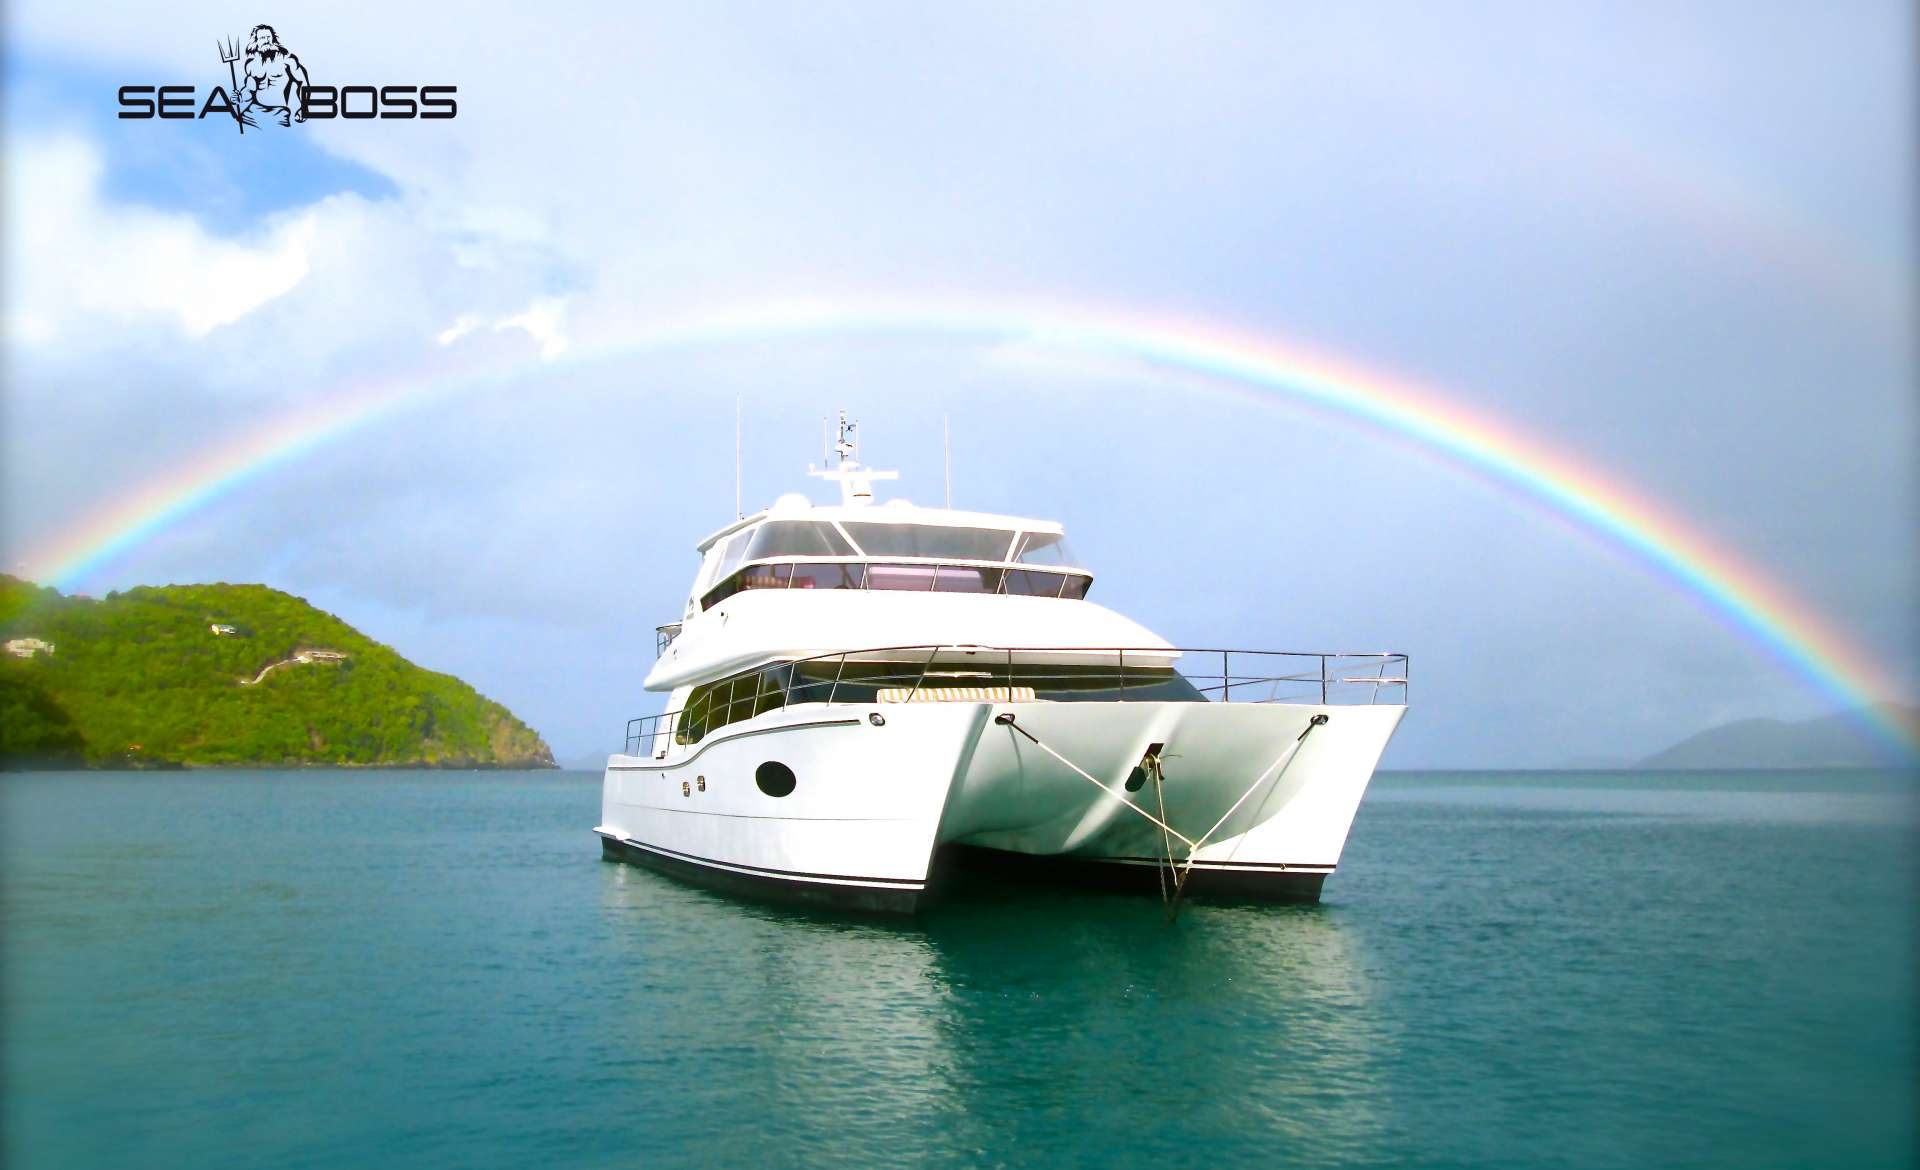 Rainbow over sailing catamaran SEA BOSS Caribbean Yachting Comeback